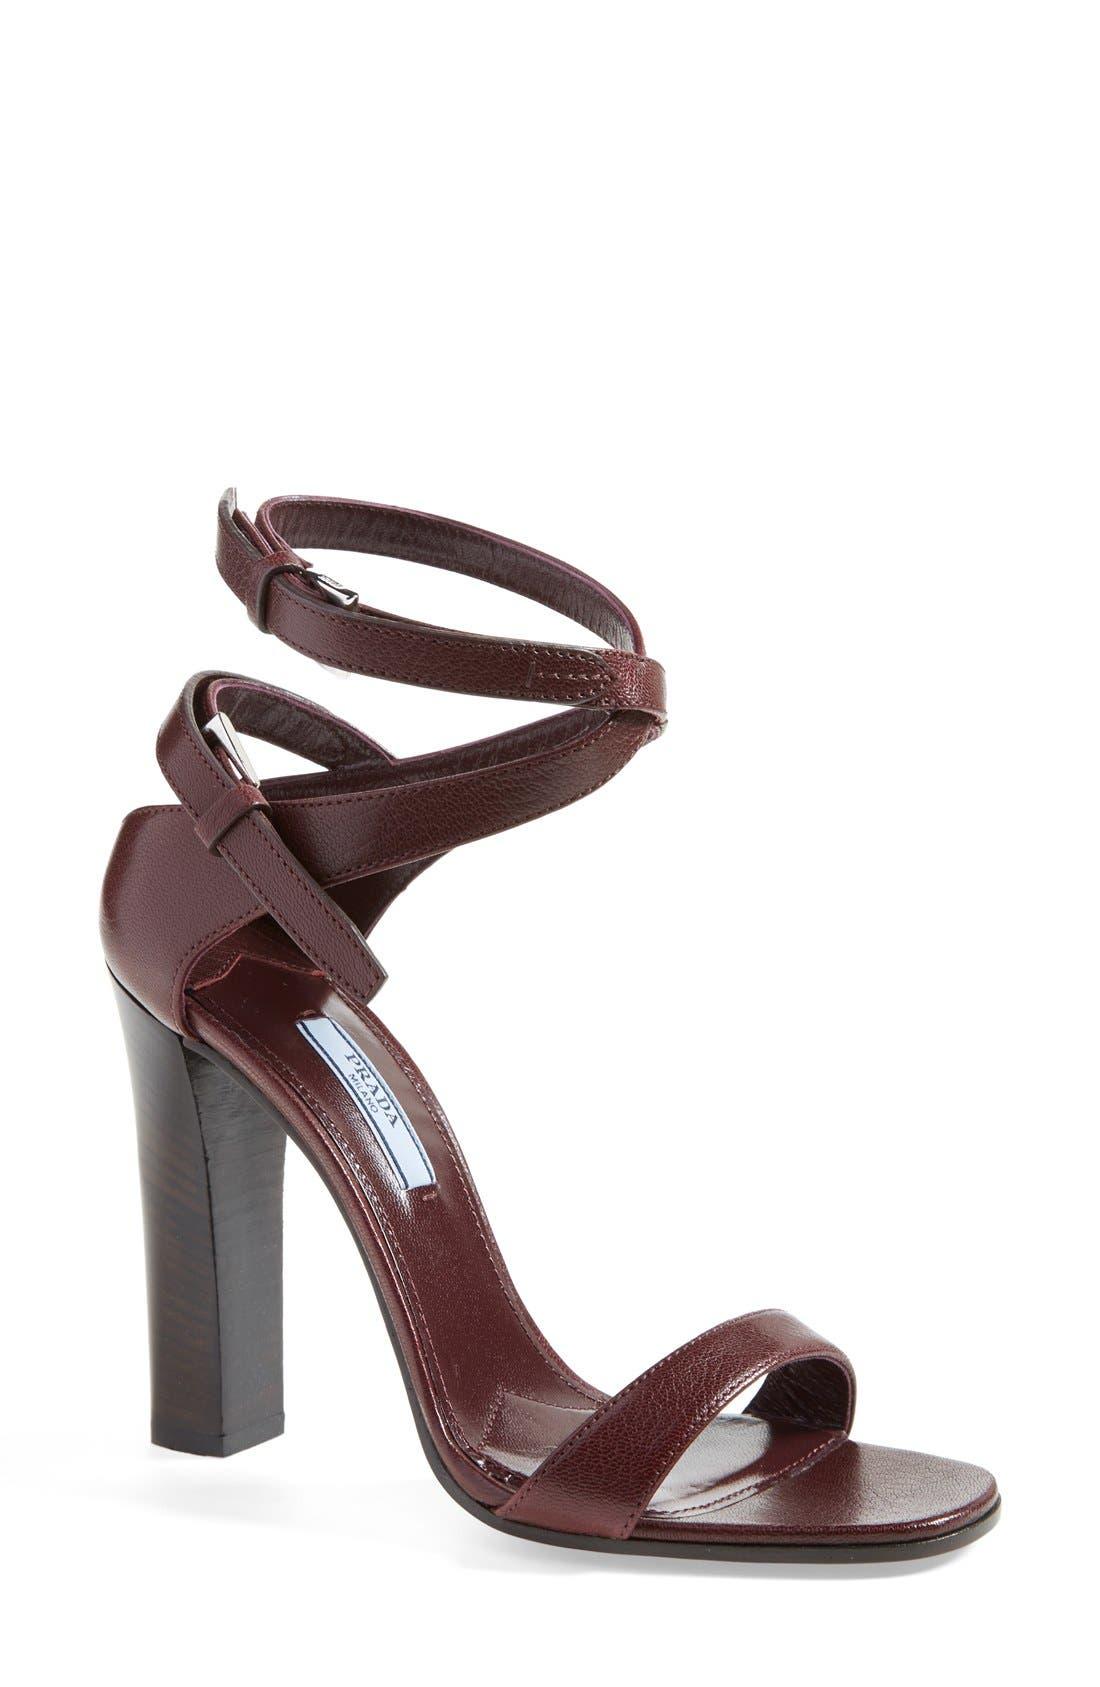 Main Image - Prada Double Ankle Strap Sandal (Women)